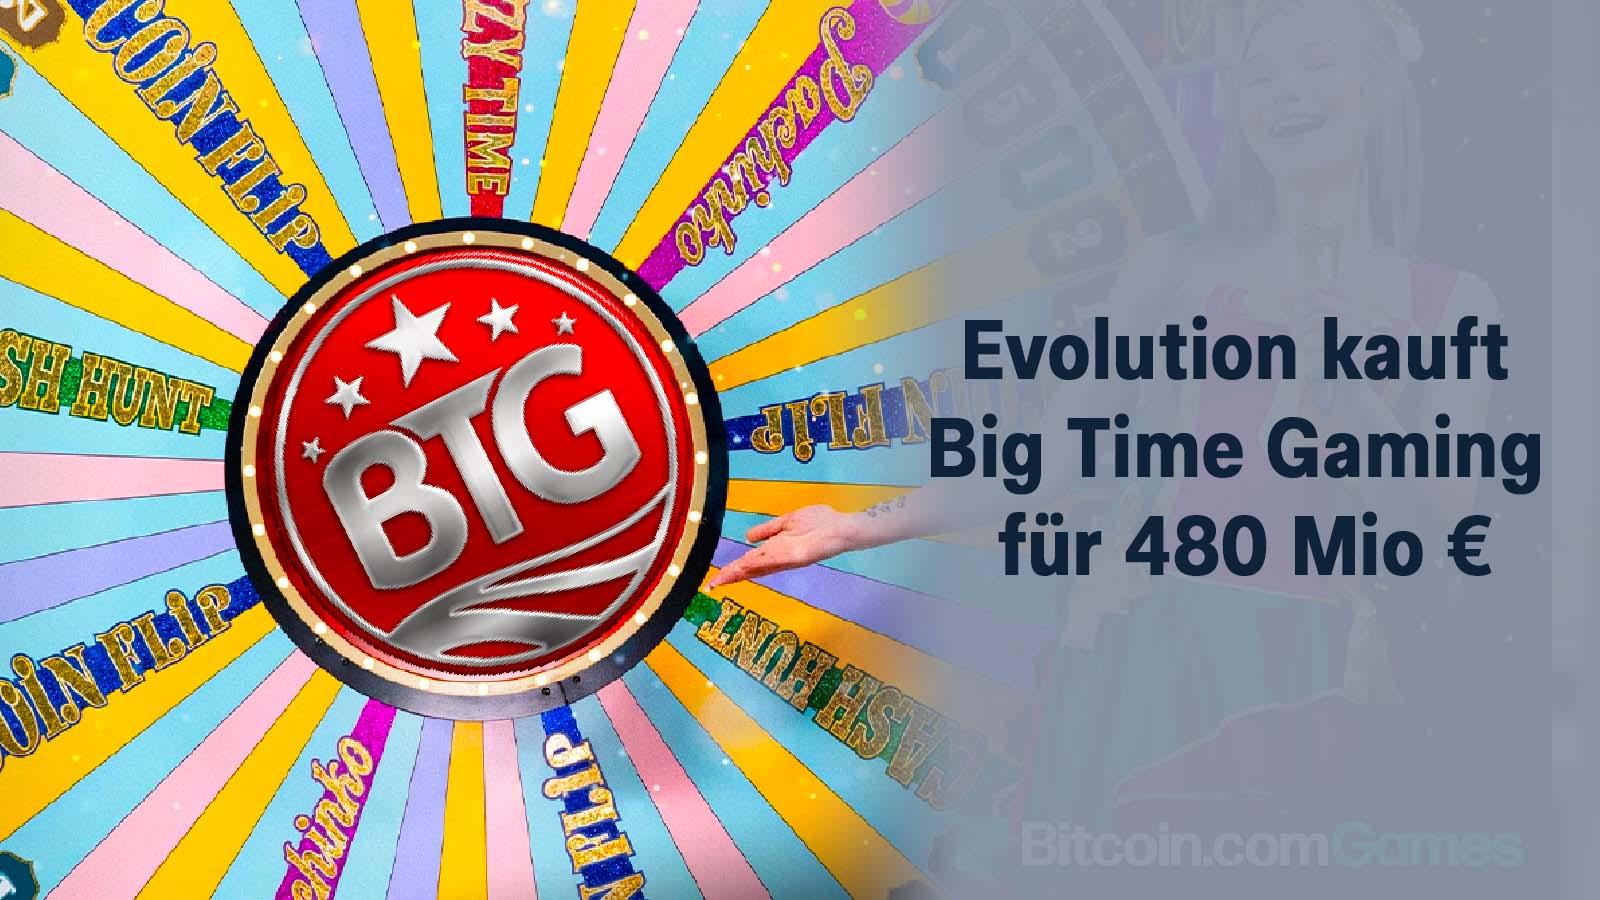 Evolution kauft Big Time Gaming